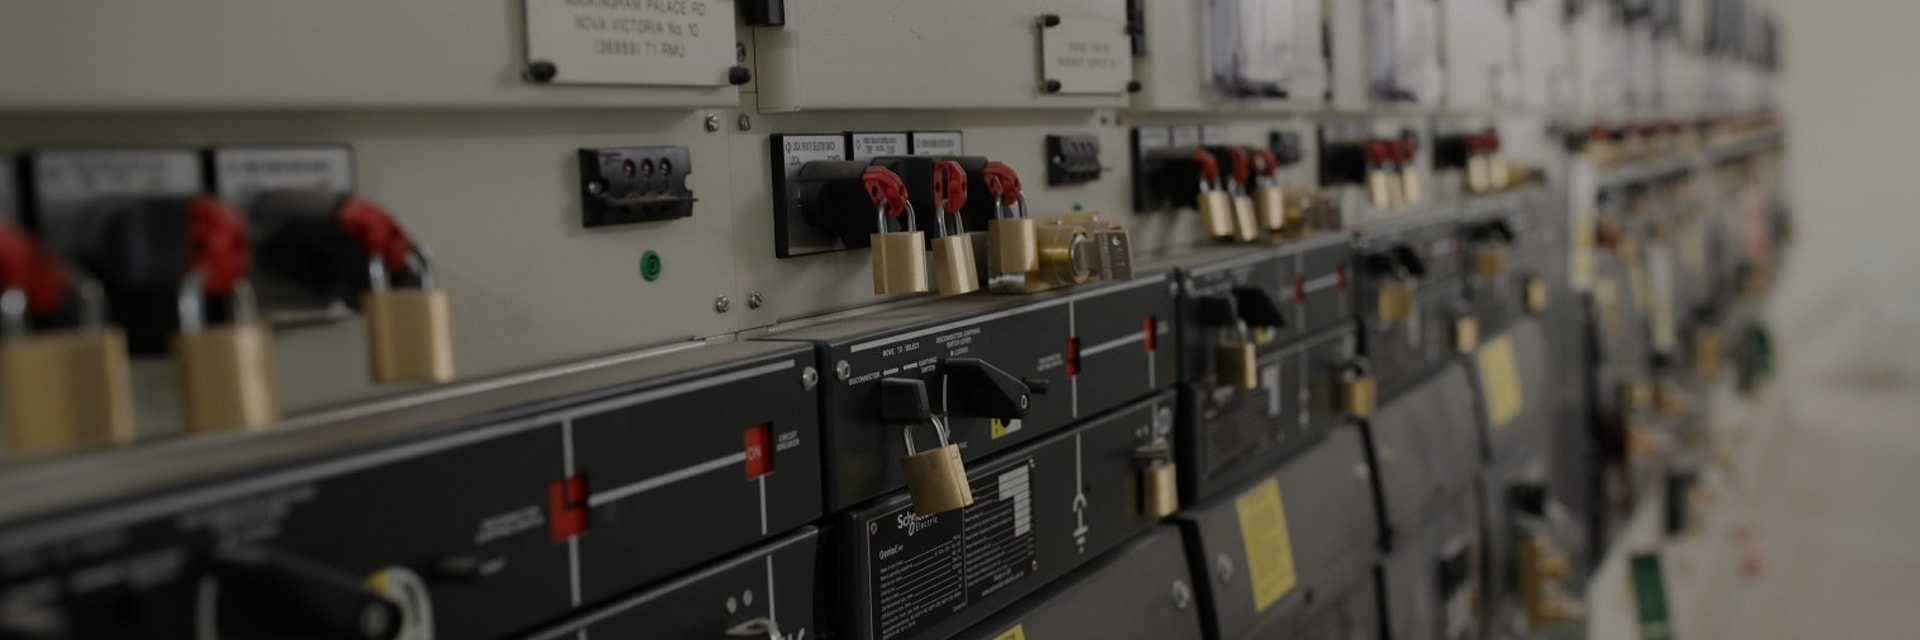 1920x640-switches-min